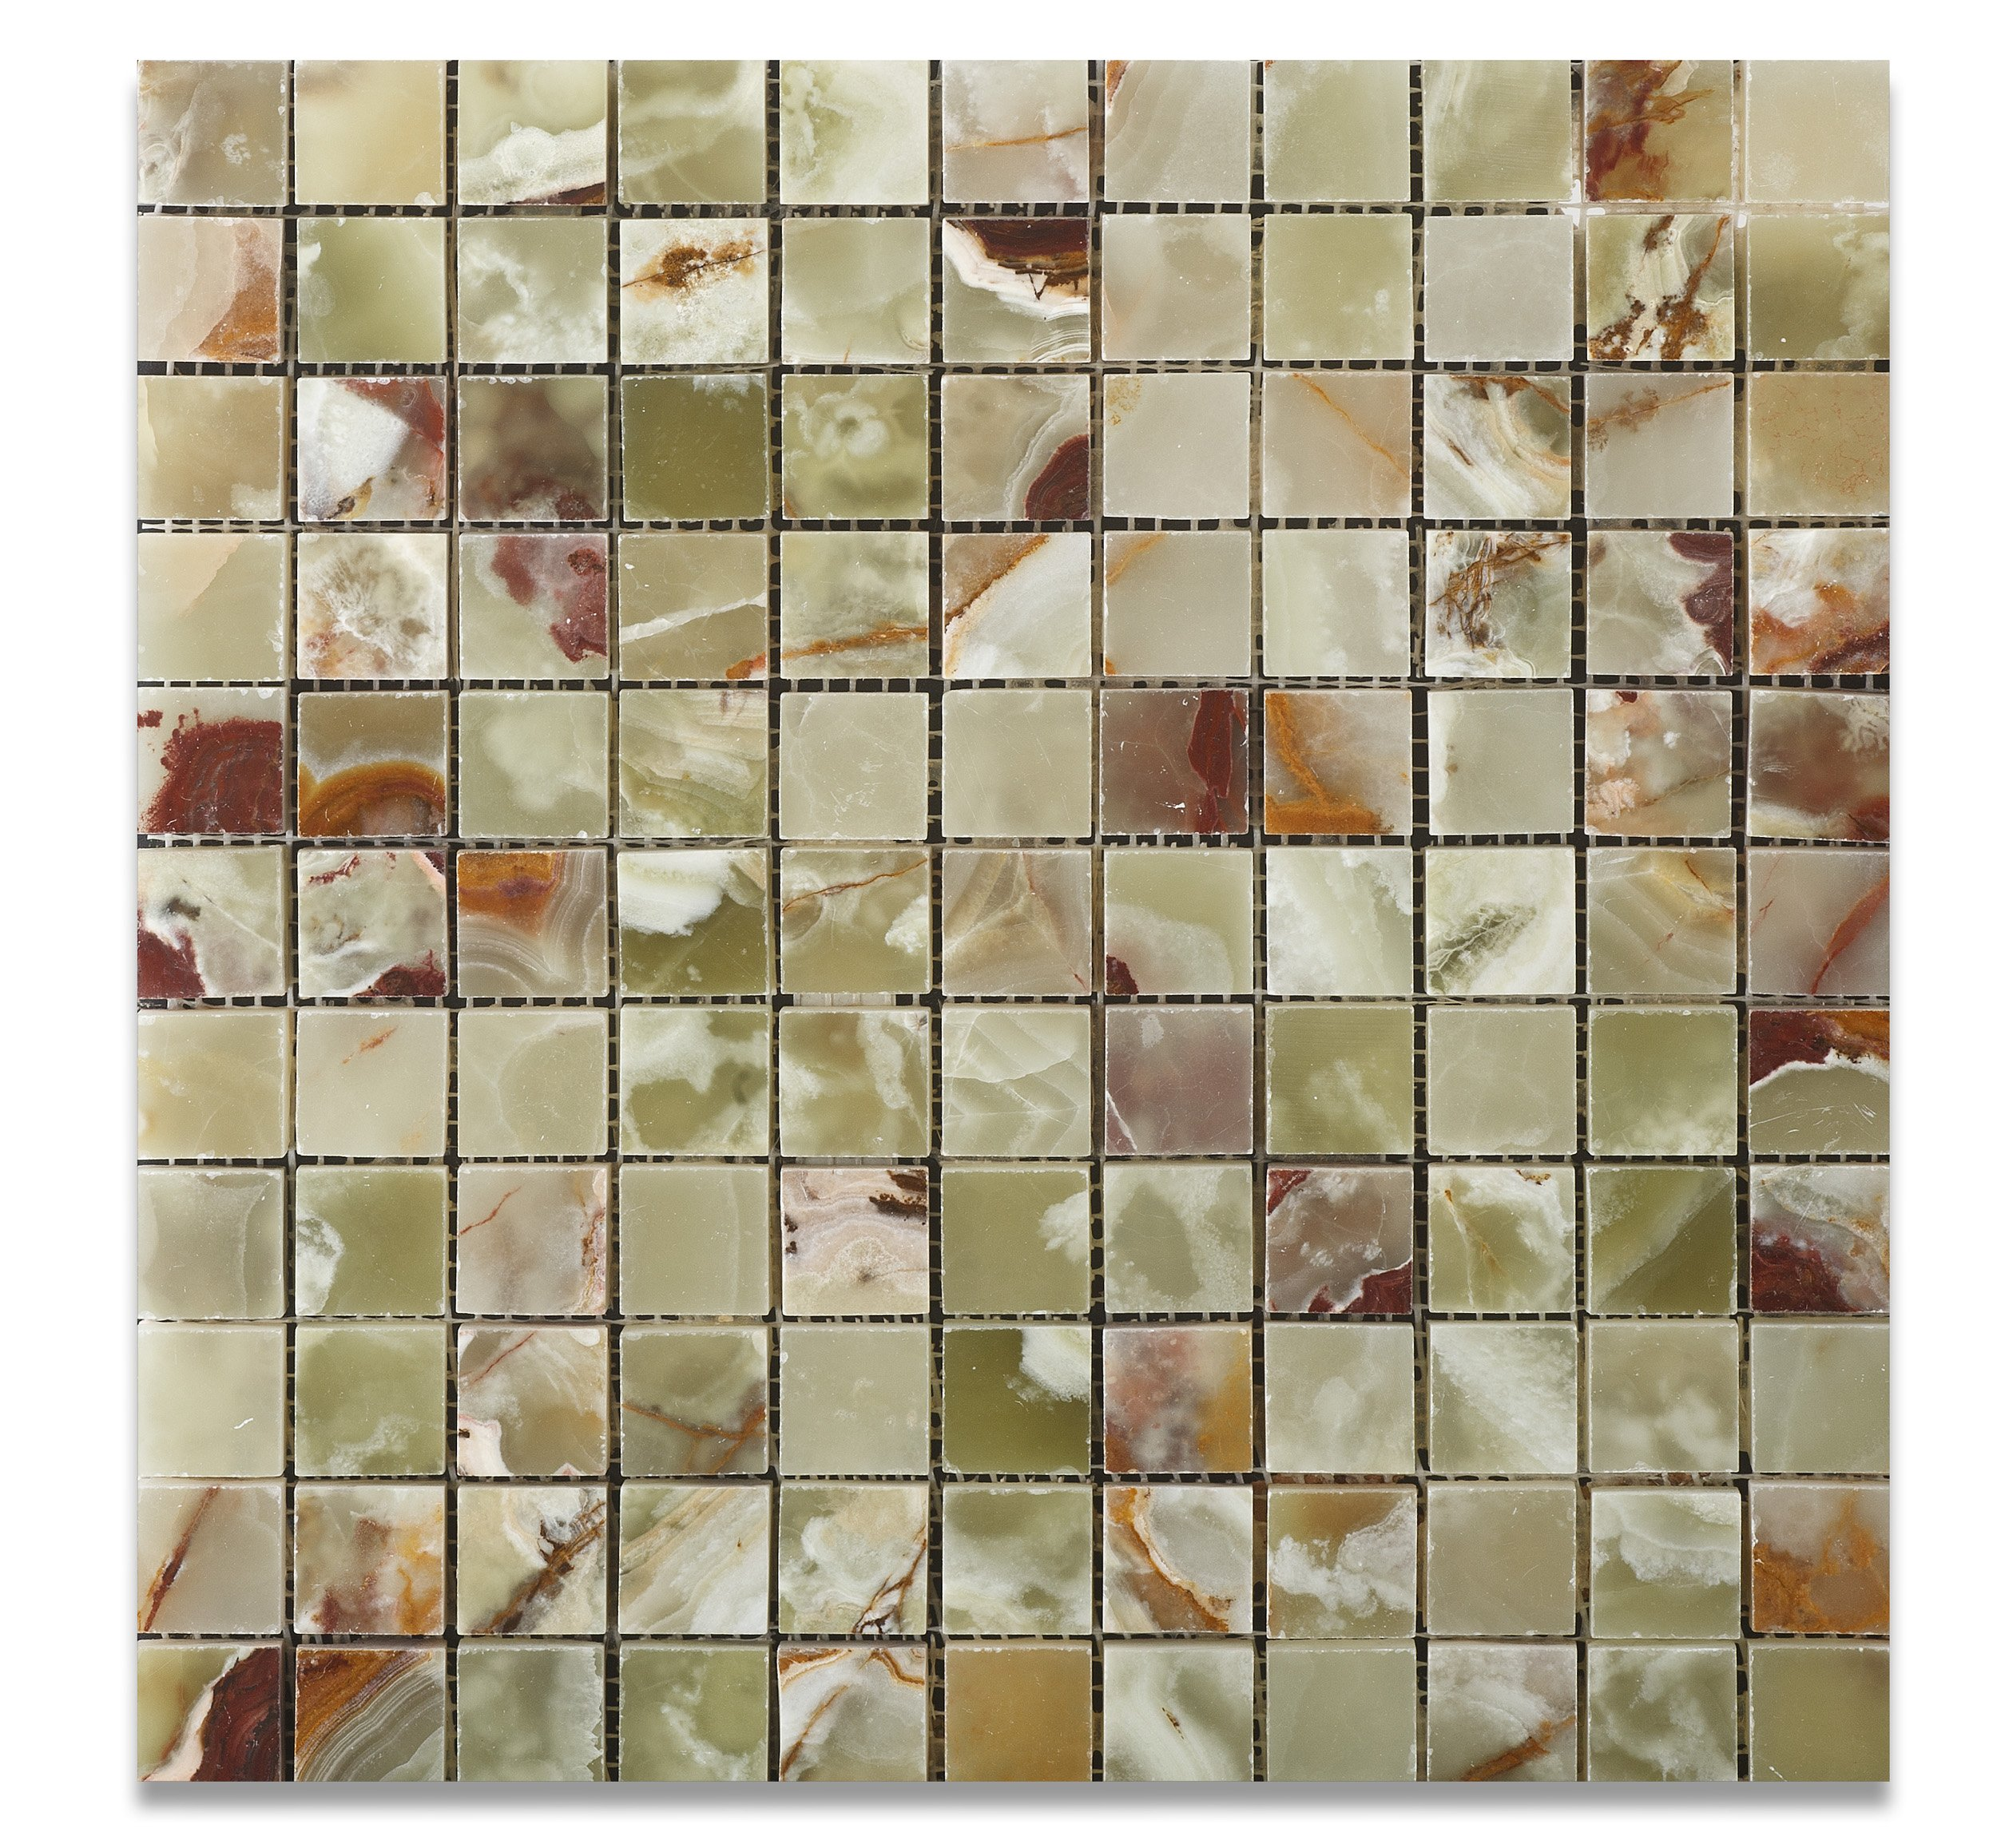 Multi Green Onyx Polished 1 X 1 Mosaic Tile on Mesh - Lot of 50 sq. ft.